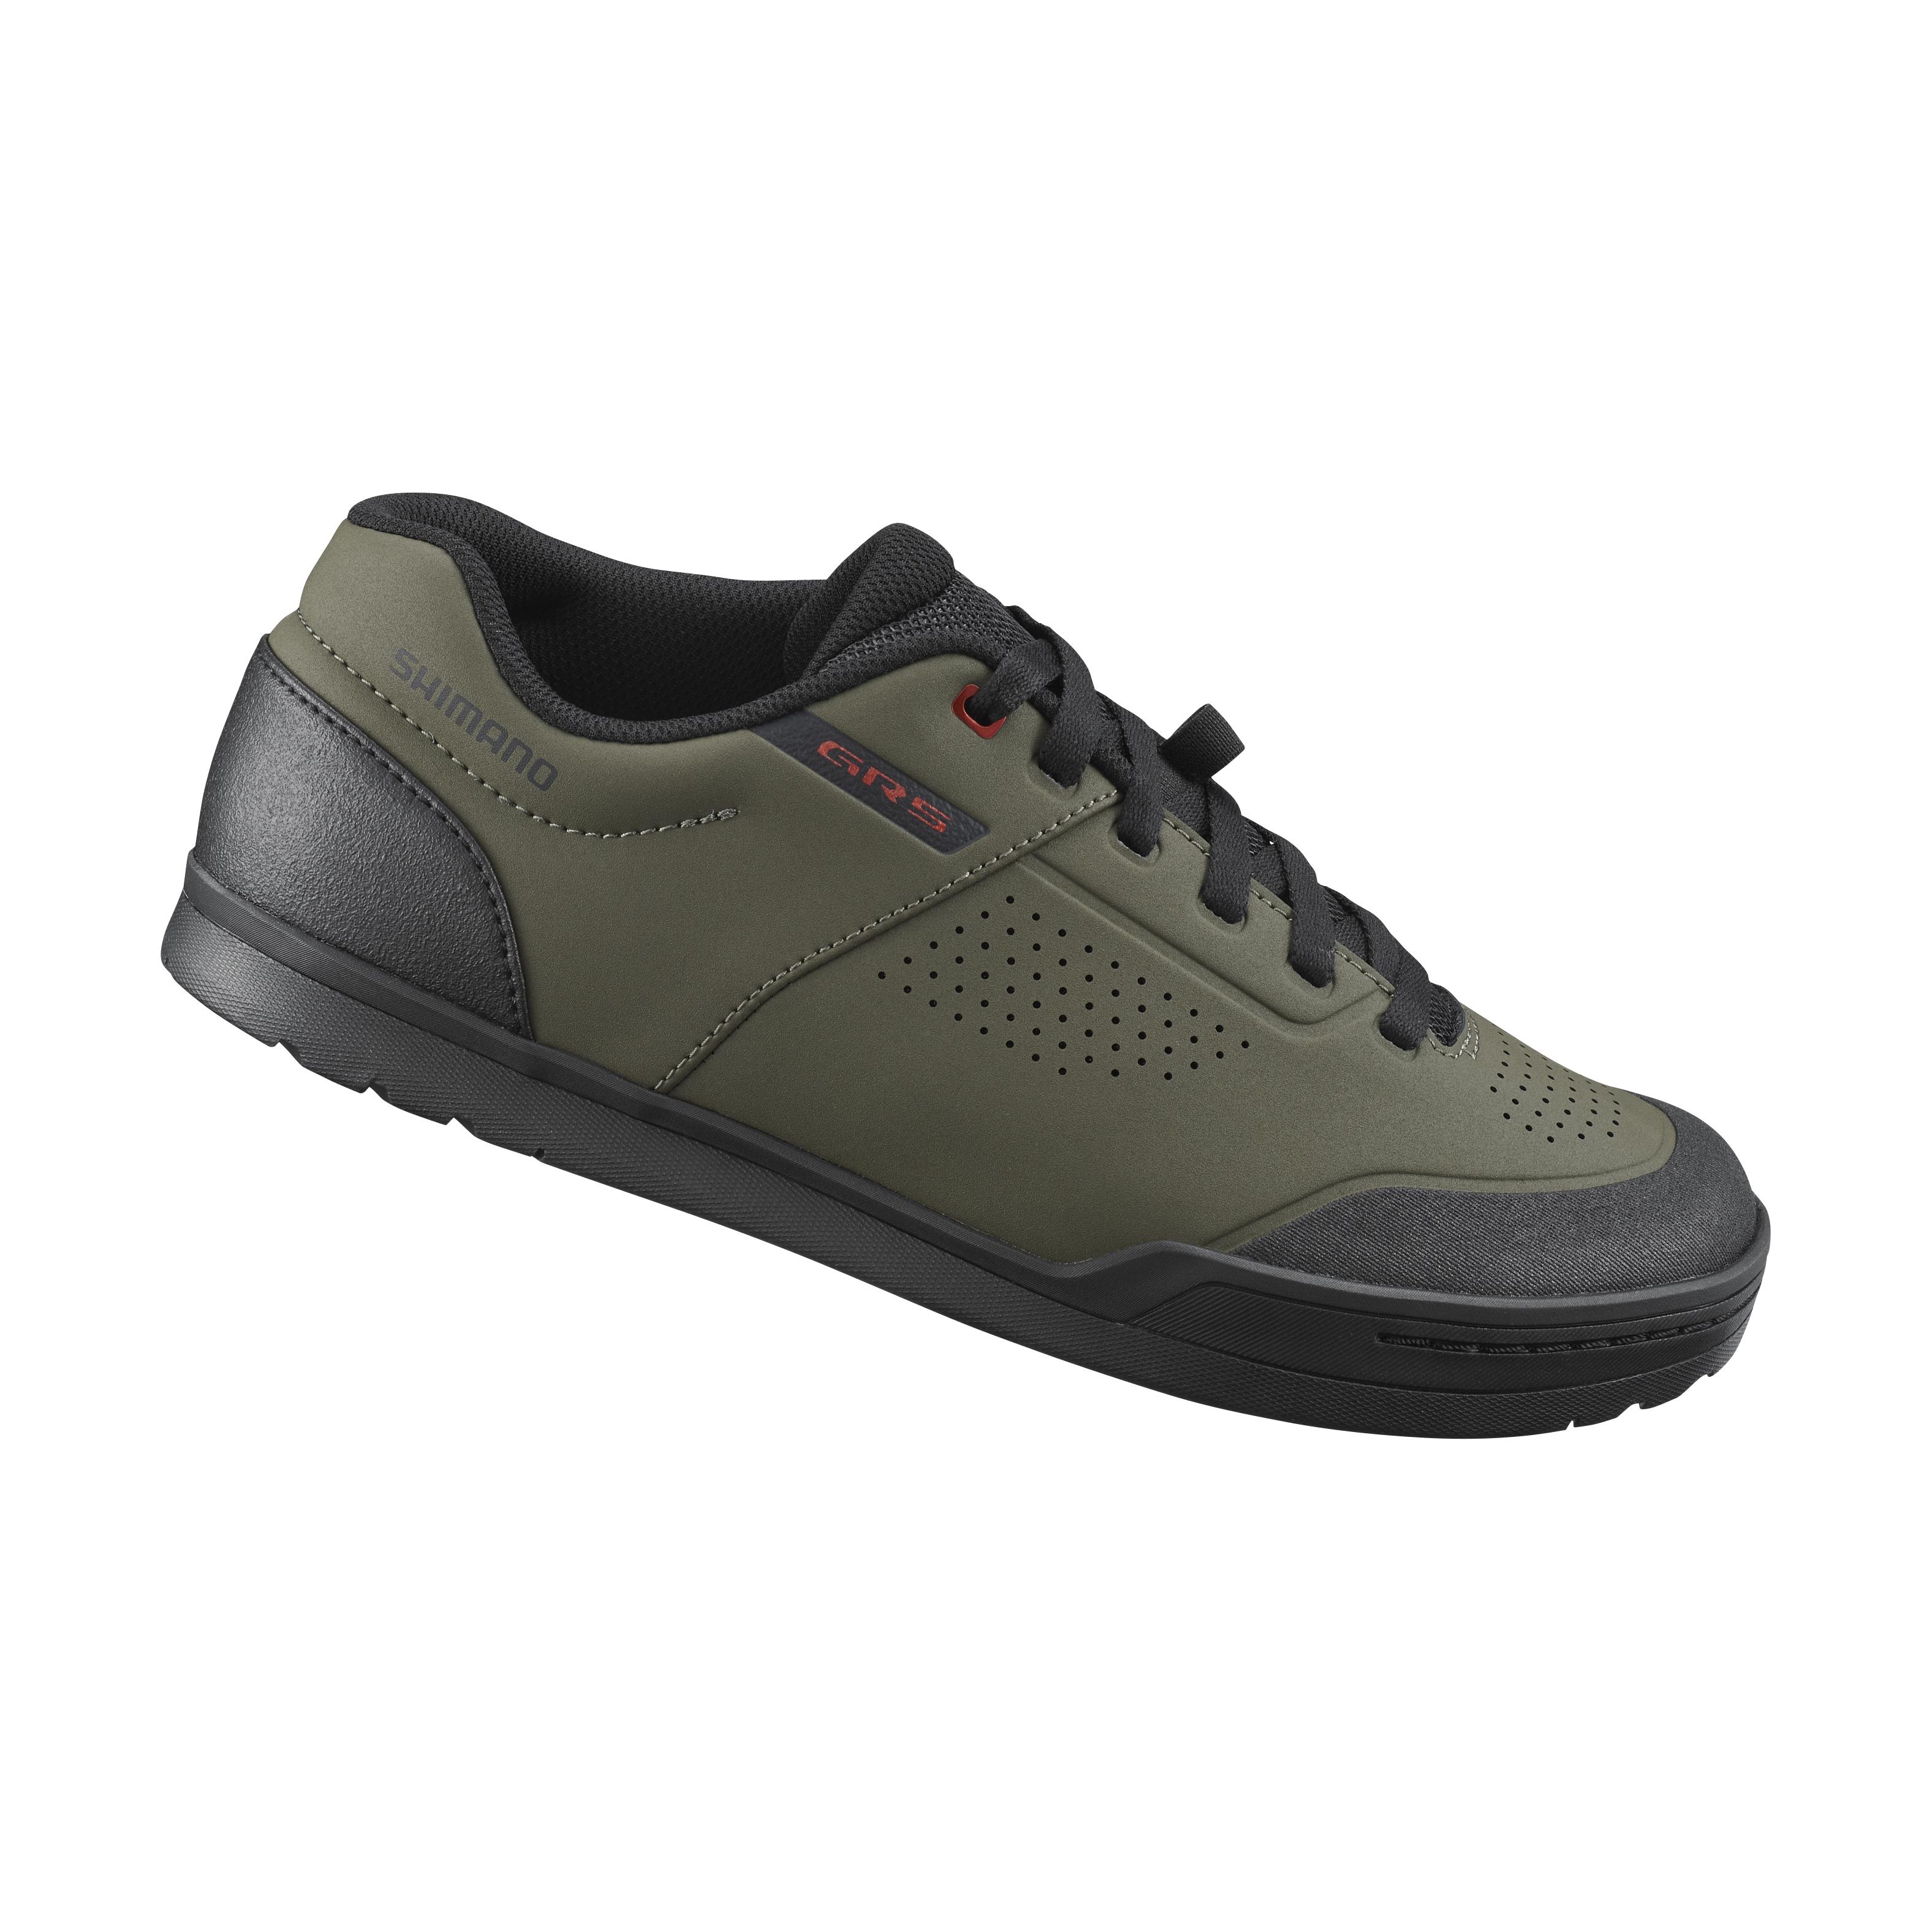 SHIMANO MTB obuv SH-GR501, olivová, 41